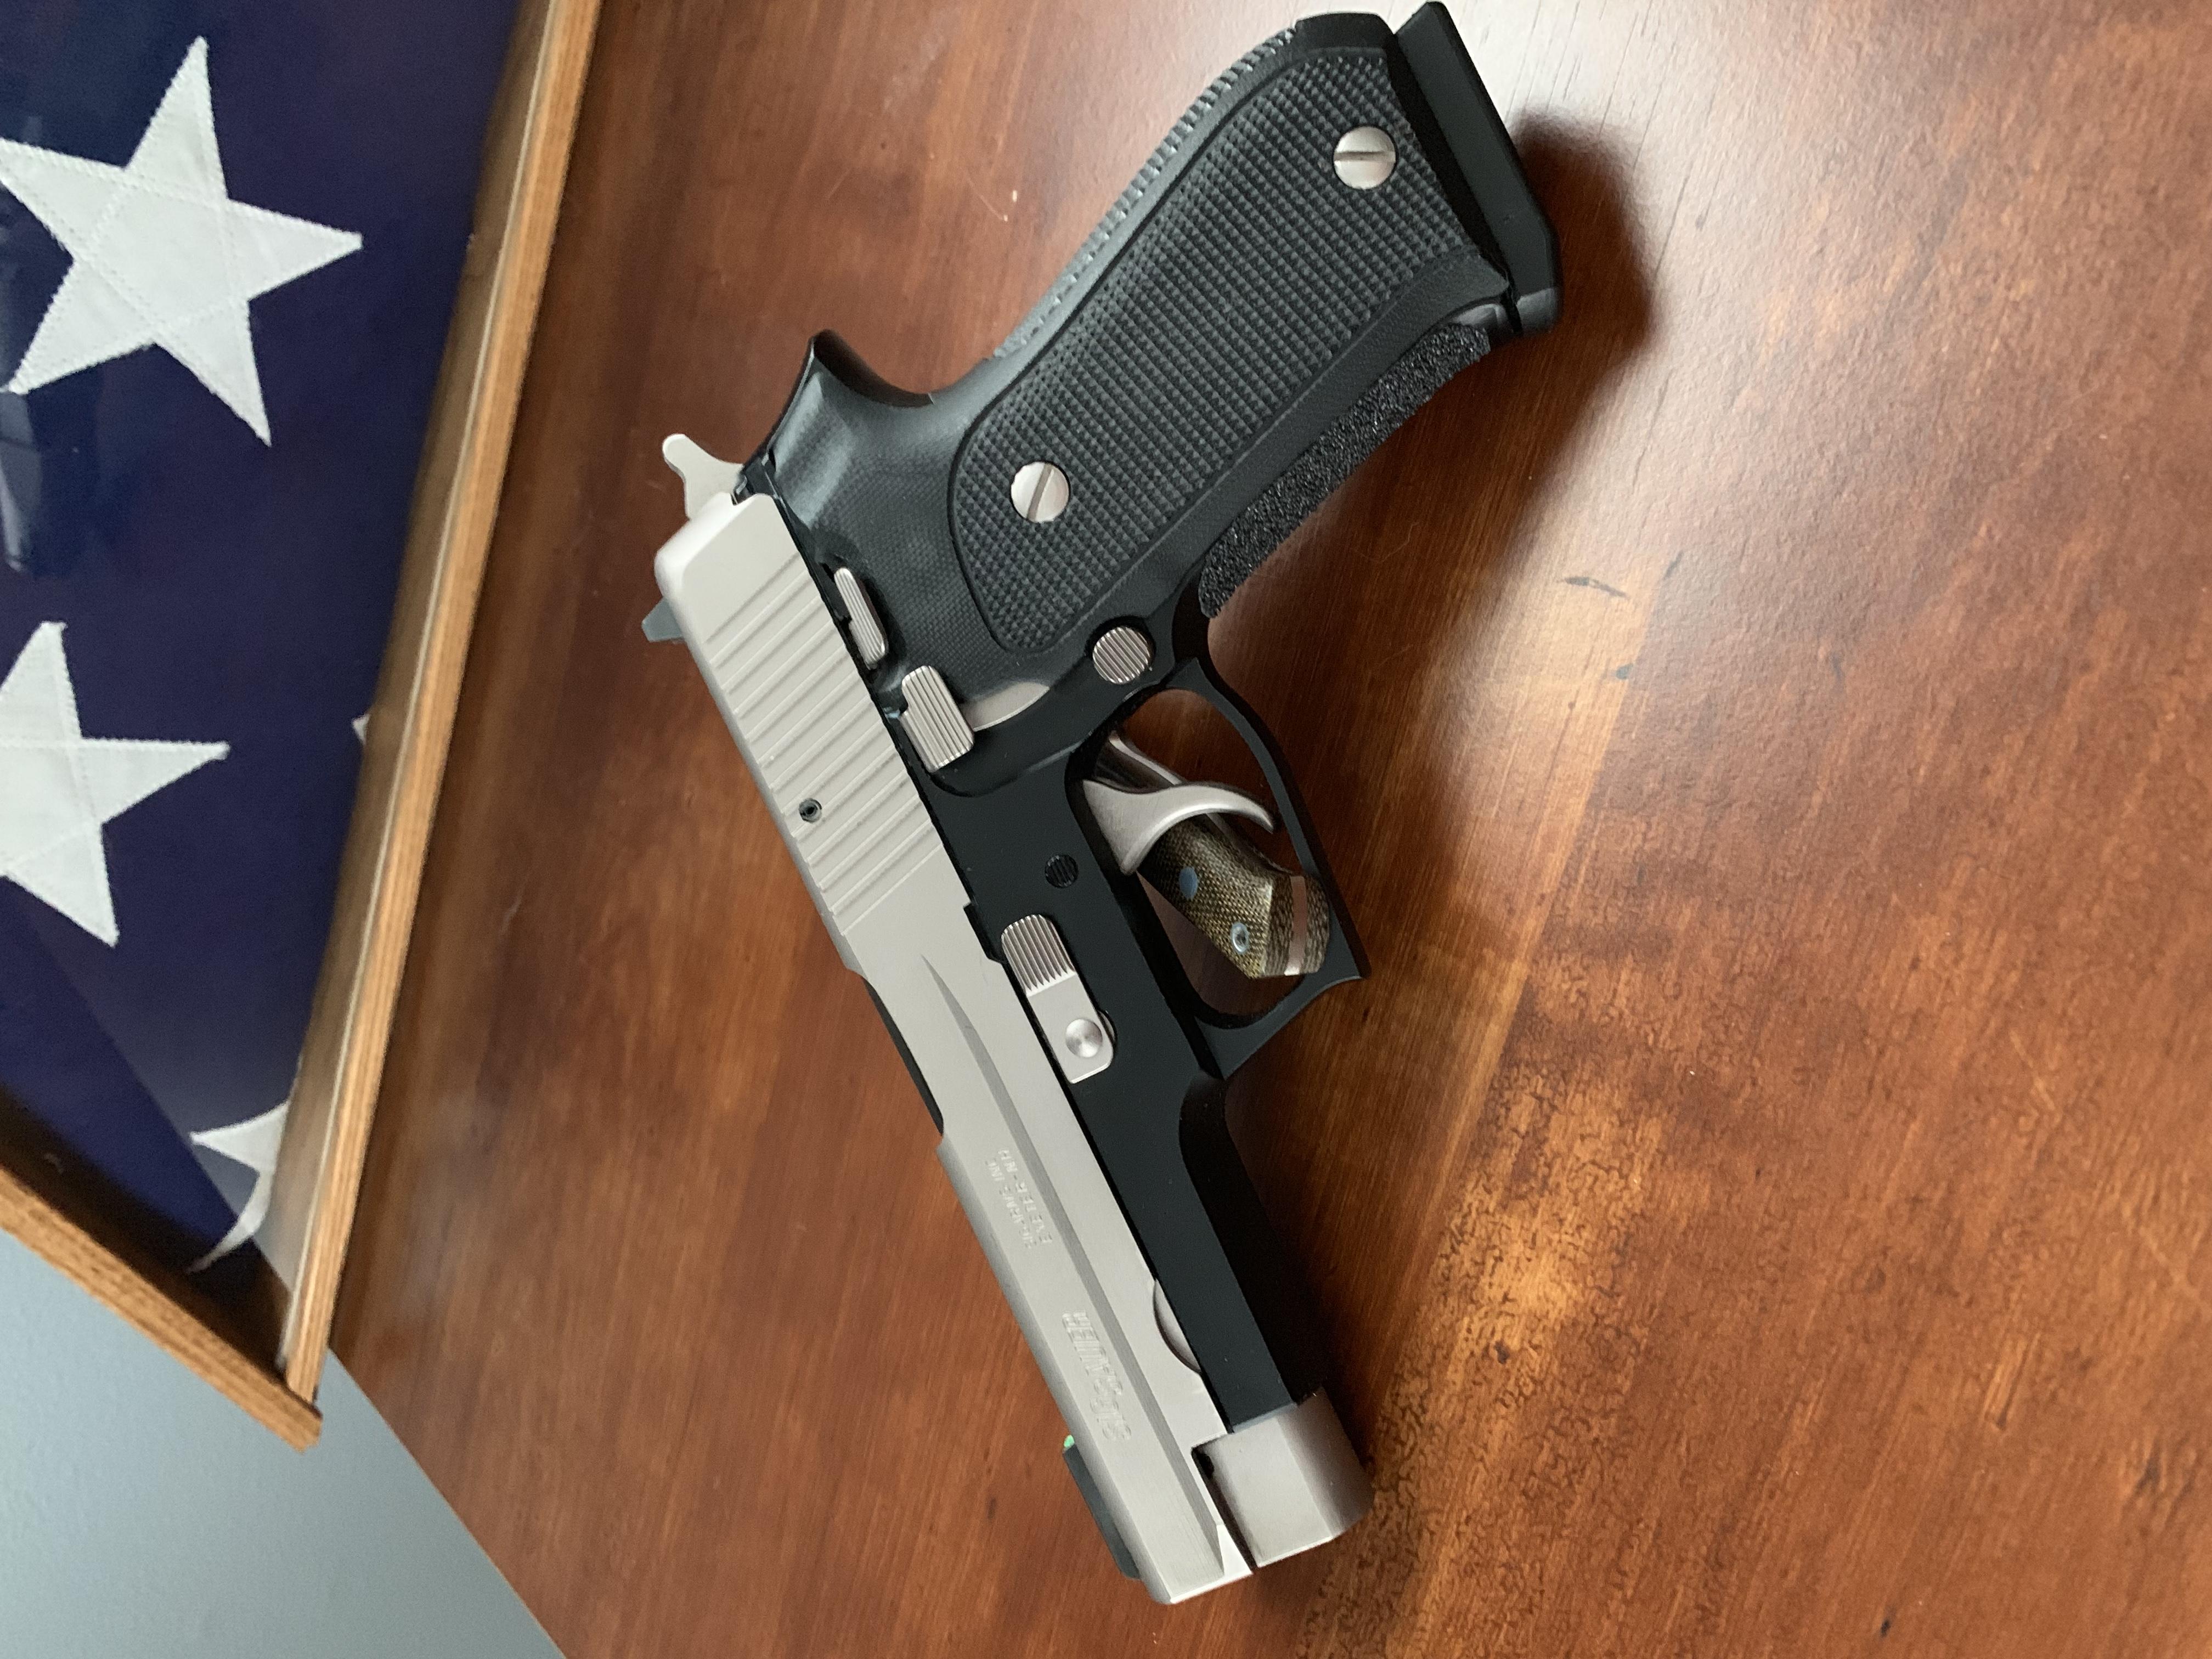 EDC suggestions, no dinky guns or glocks.-59439721-10ea-4c22-a907-a2a1335745b0.jpeg